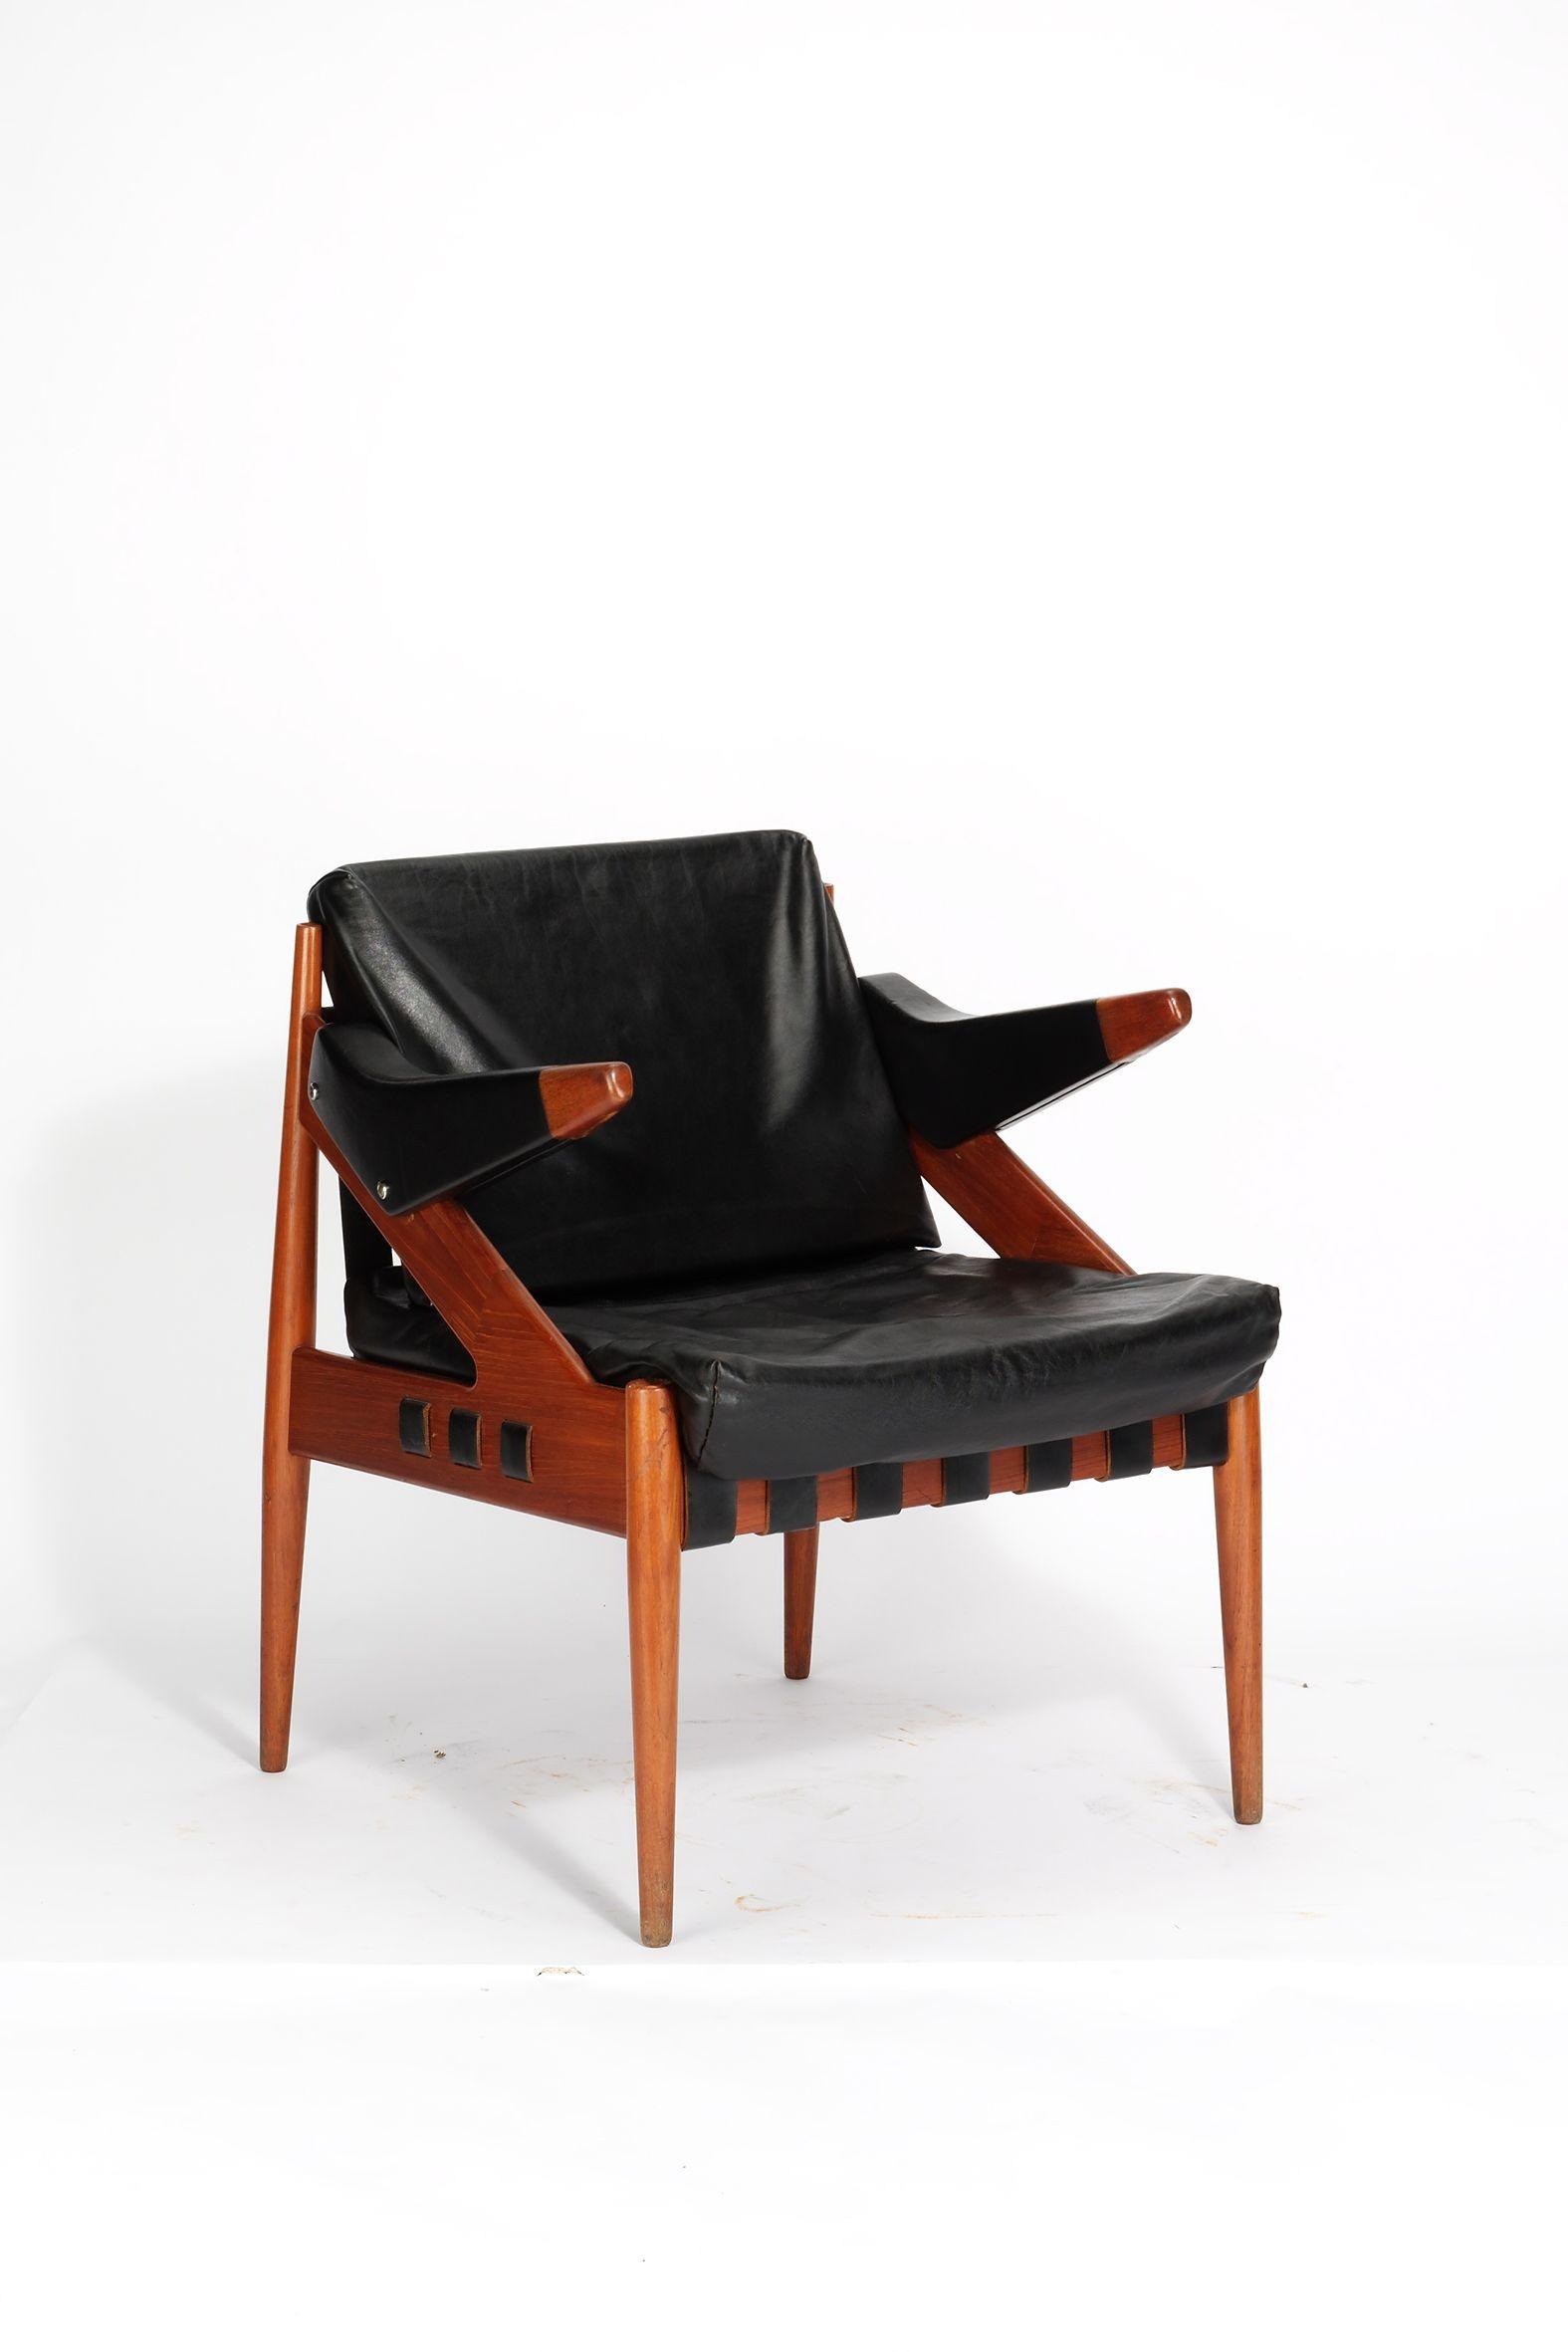 egon eiermann armlehnstuhl se 122 a 1958 1959 egon eiermann furniture pinterest m bel. Black Bedroom Furniture Sets. Home Design Ideas